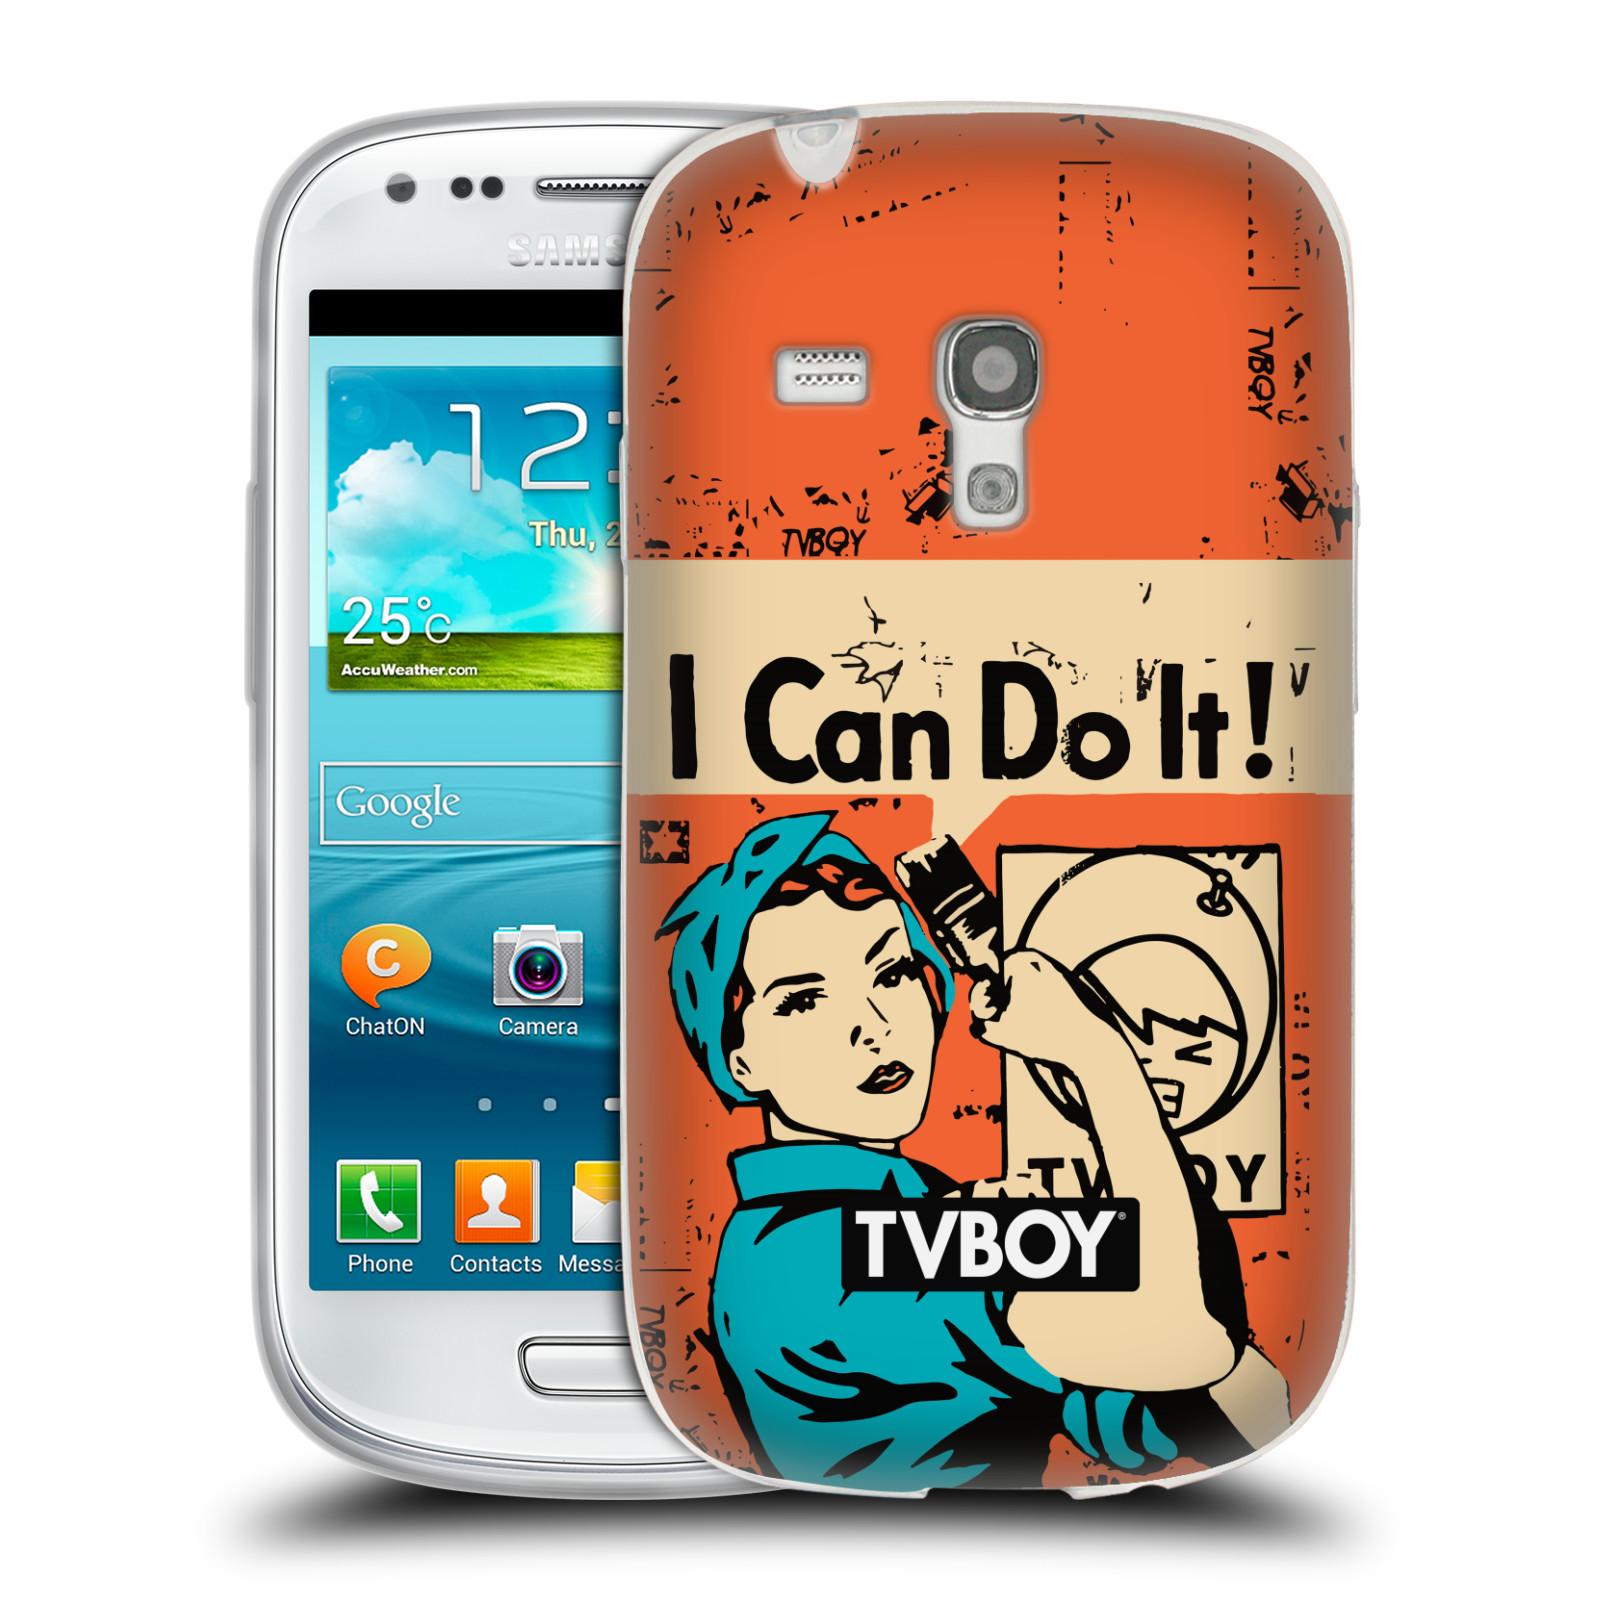 Silikonové pouzdro na mobil Samsung Galaxy S III Mini HEAD CASE - TVBOY - I can do it (Silikonový kryt či obal na mobilní telefon s licencovaným motivem TVBOY pro Samsung Galaxy S III Mini GT-i8190)